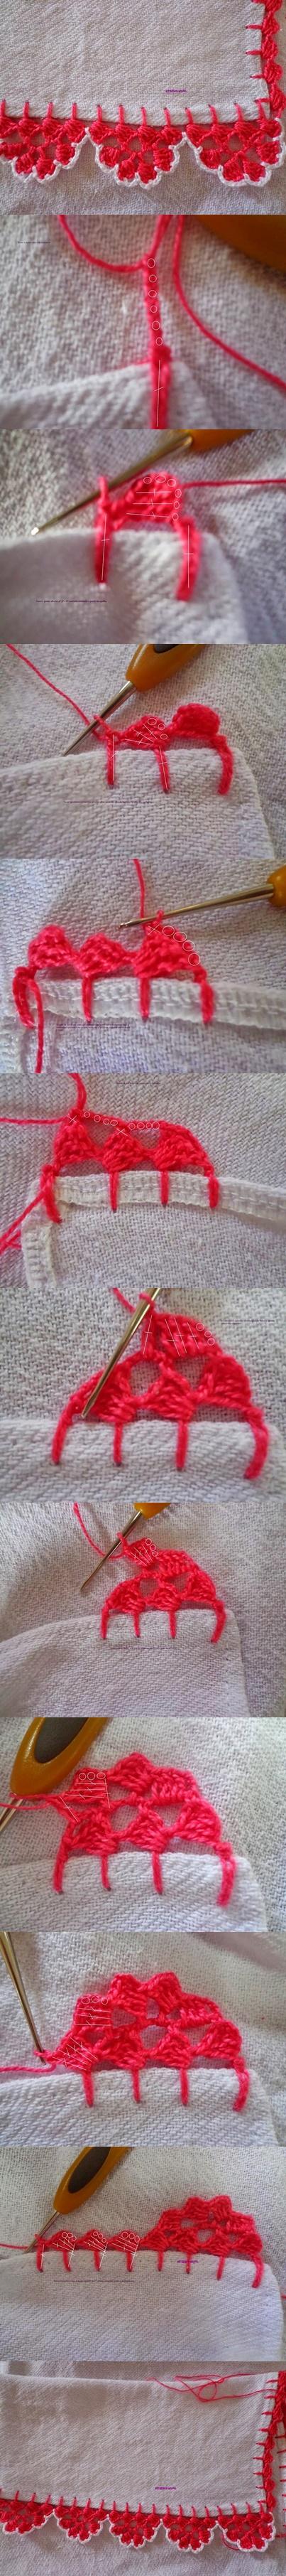 crochet lacy beak wonderful DIY T Wonderful DIY Pretty Crochet Lacy Beak